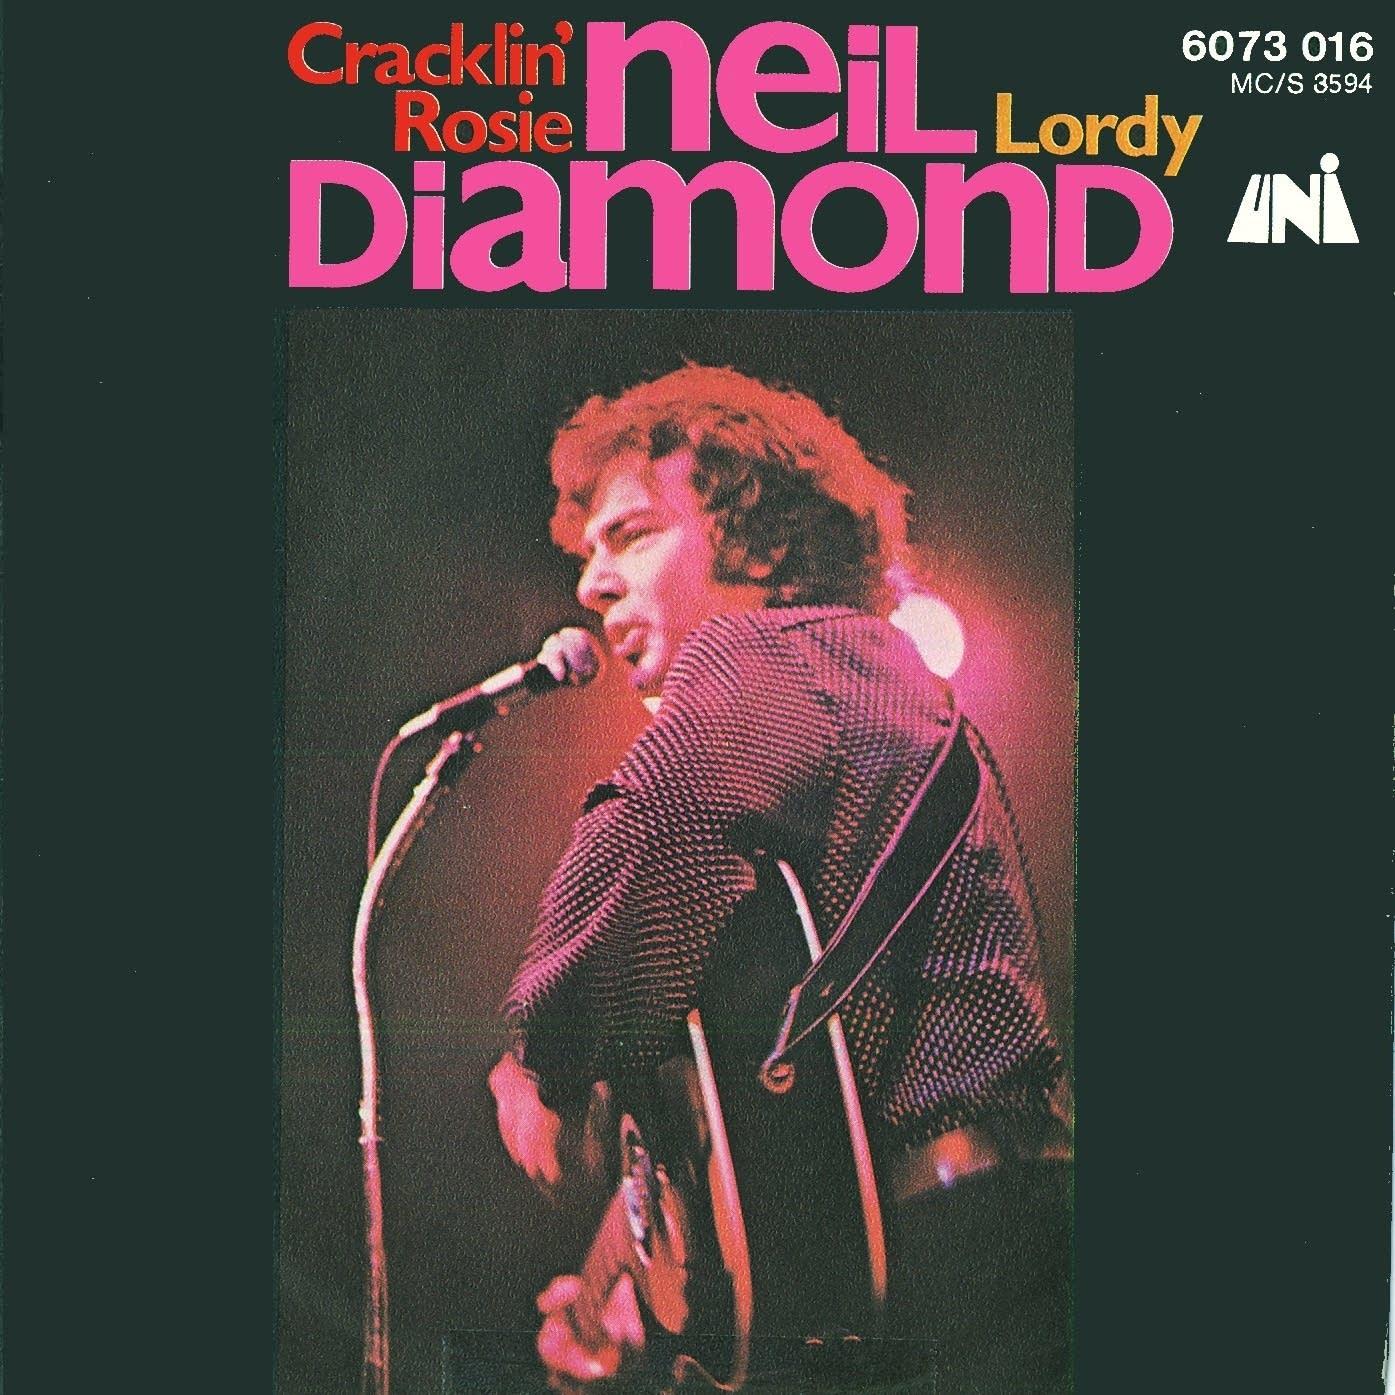 Neil Diamond Cracklin Rosie